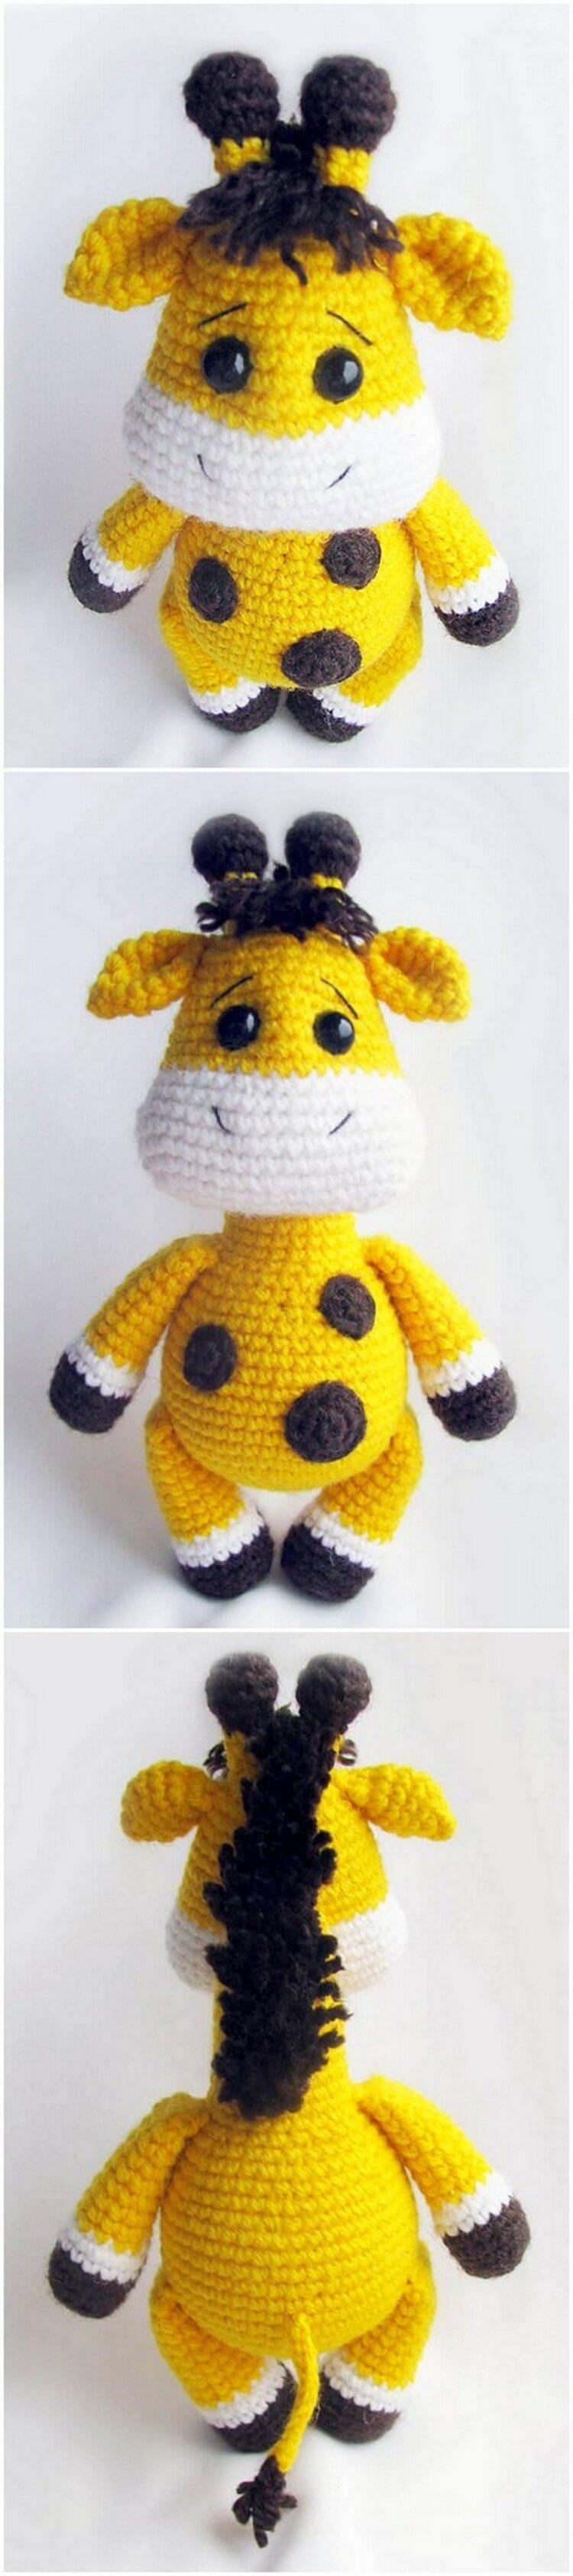 Crochet Amigurumi Pattern (65)